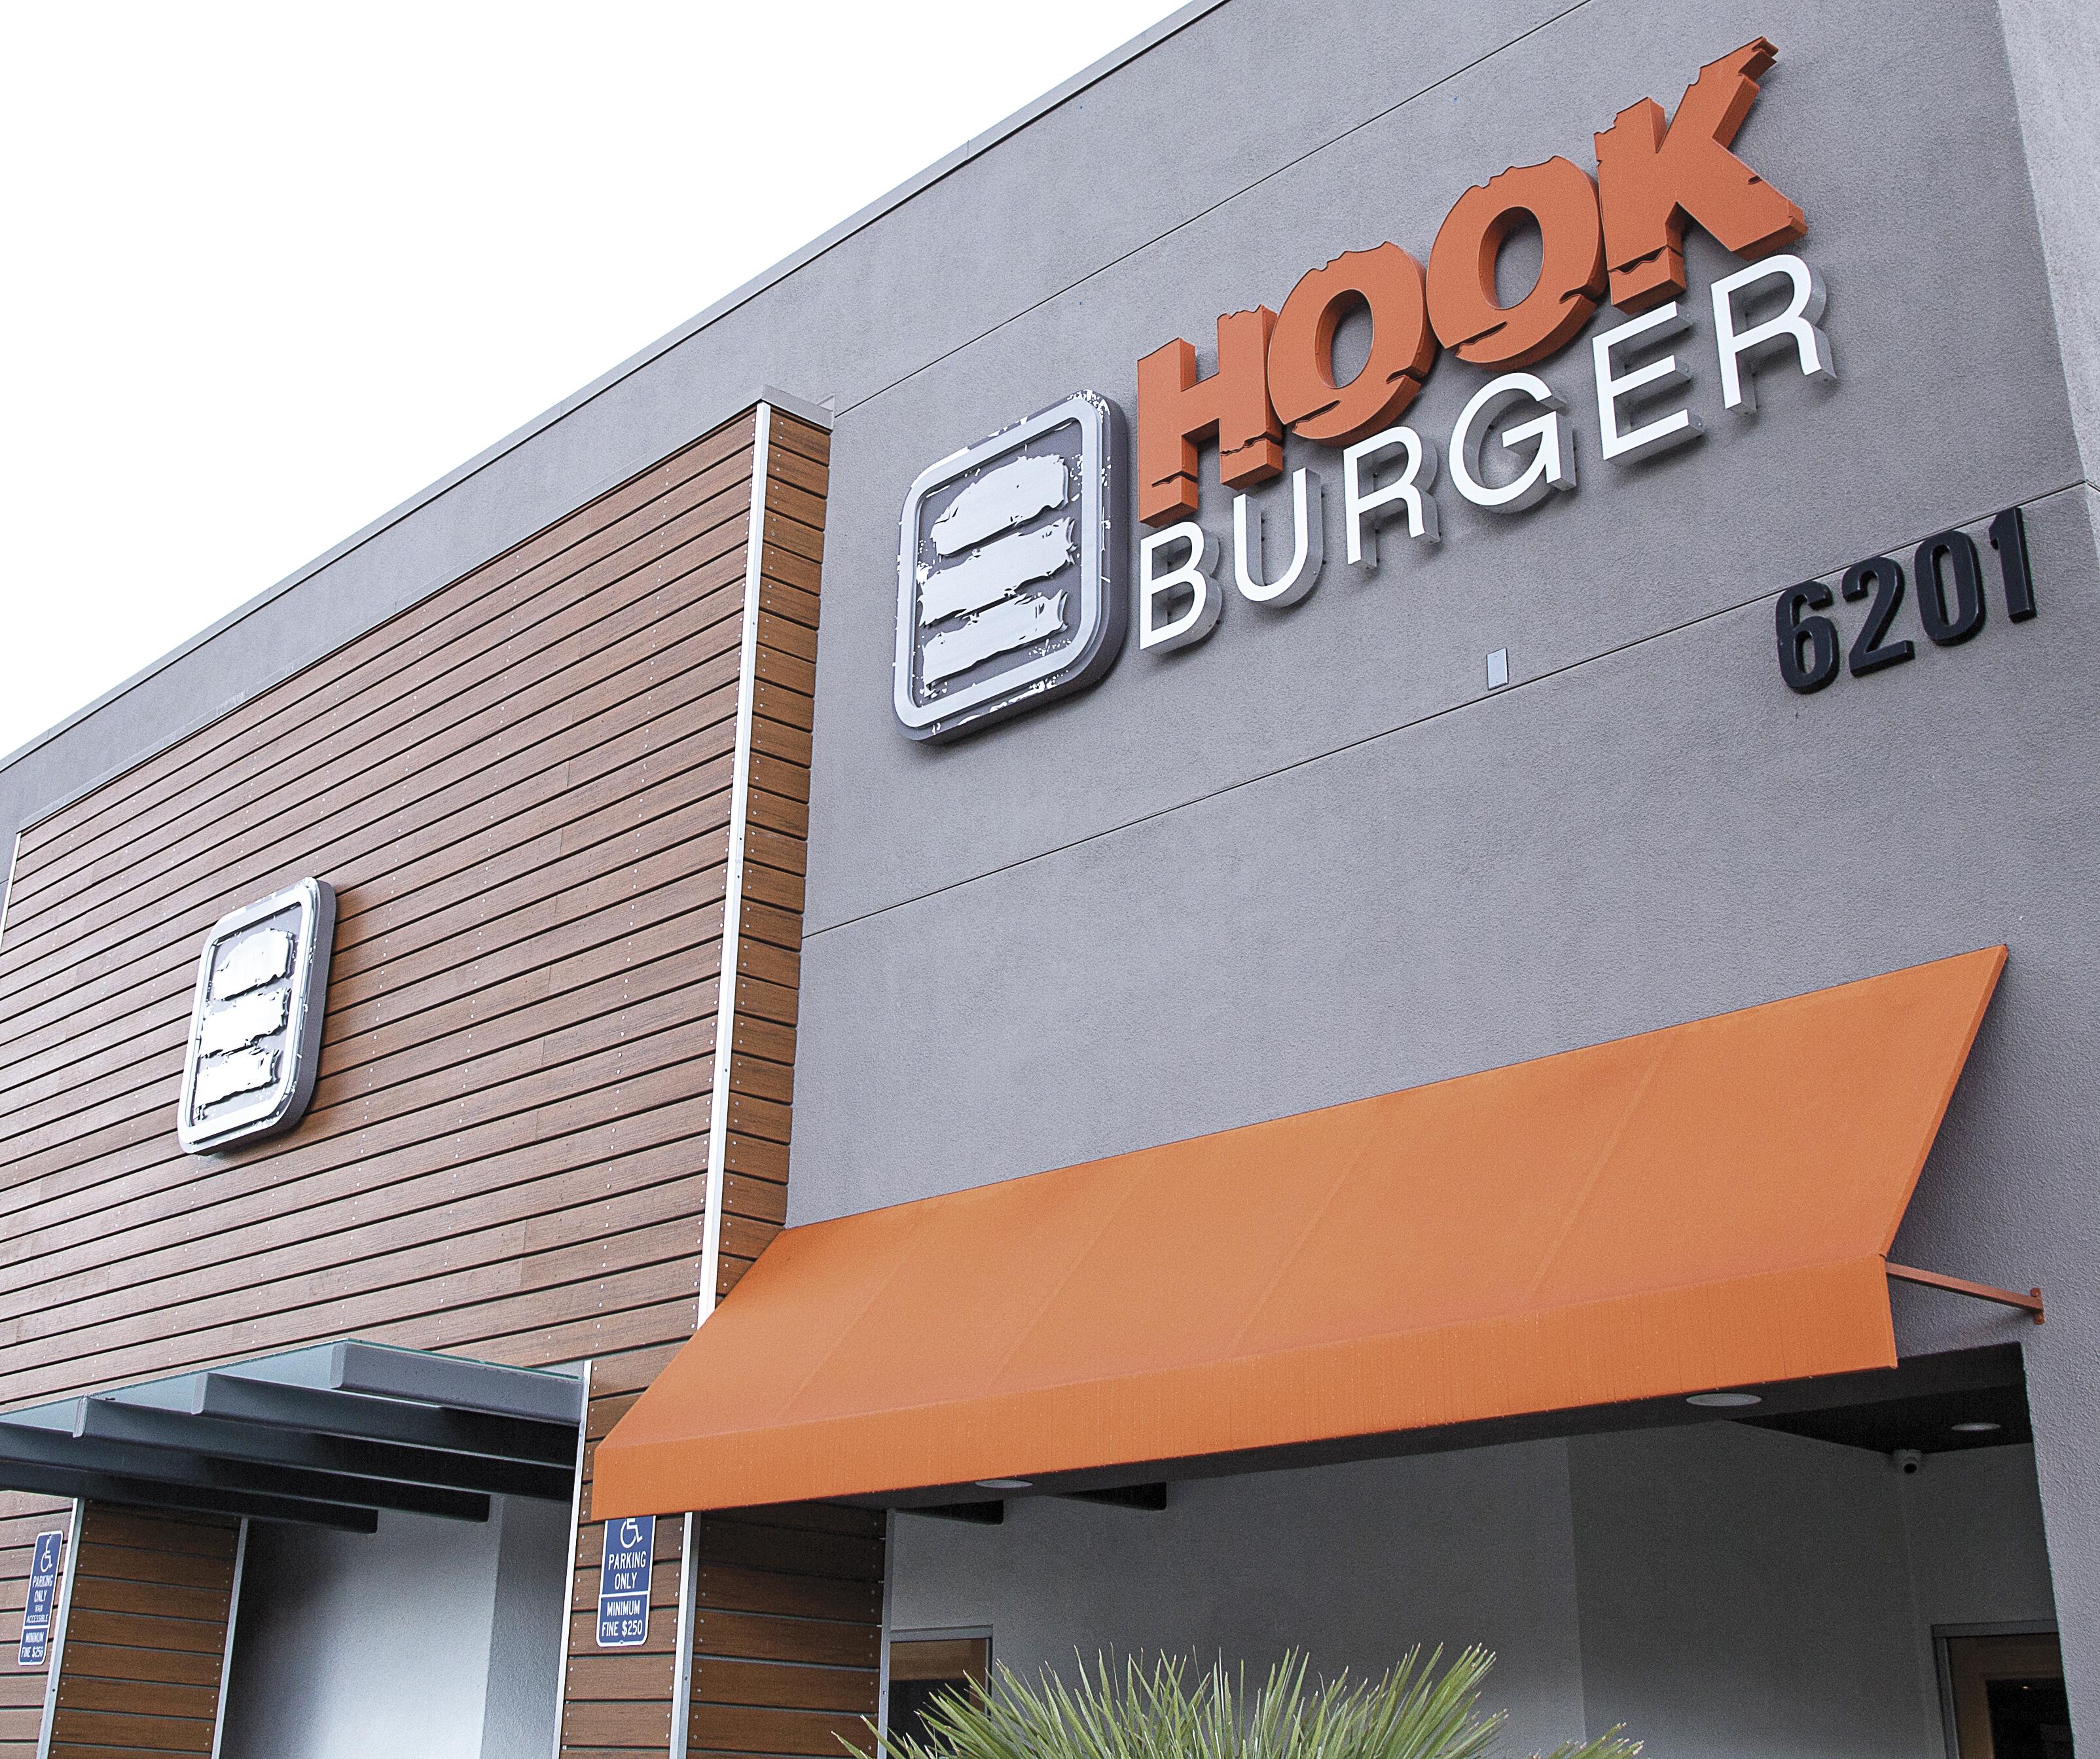 Food Review: Hook Burger